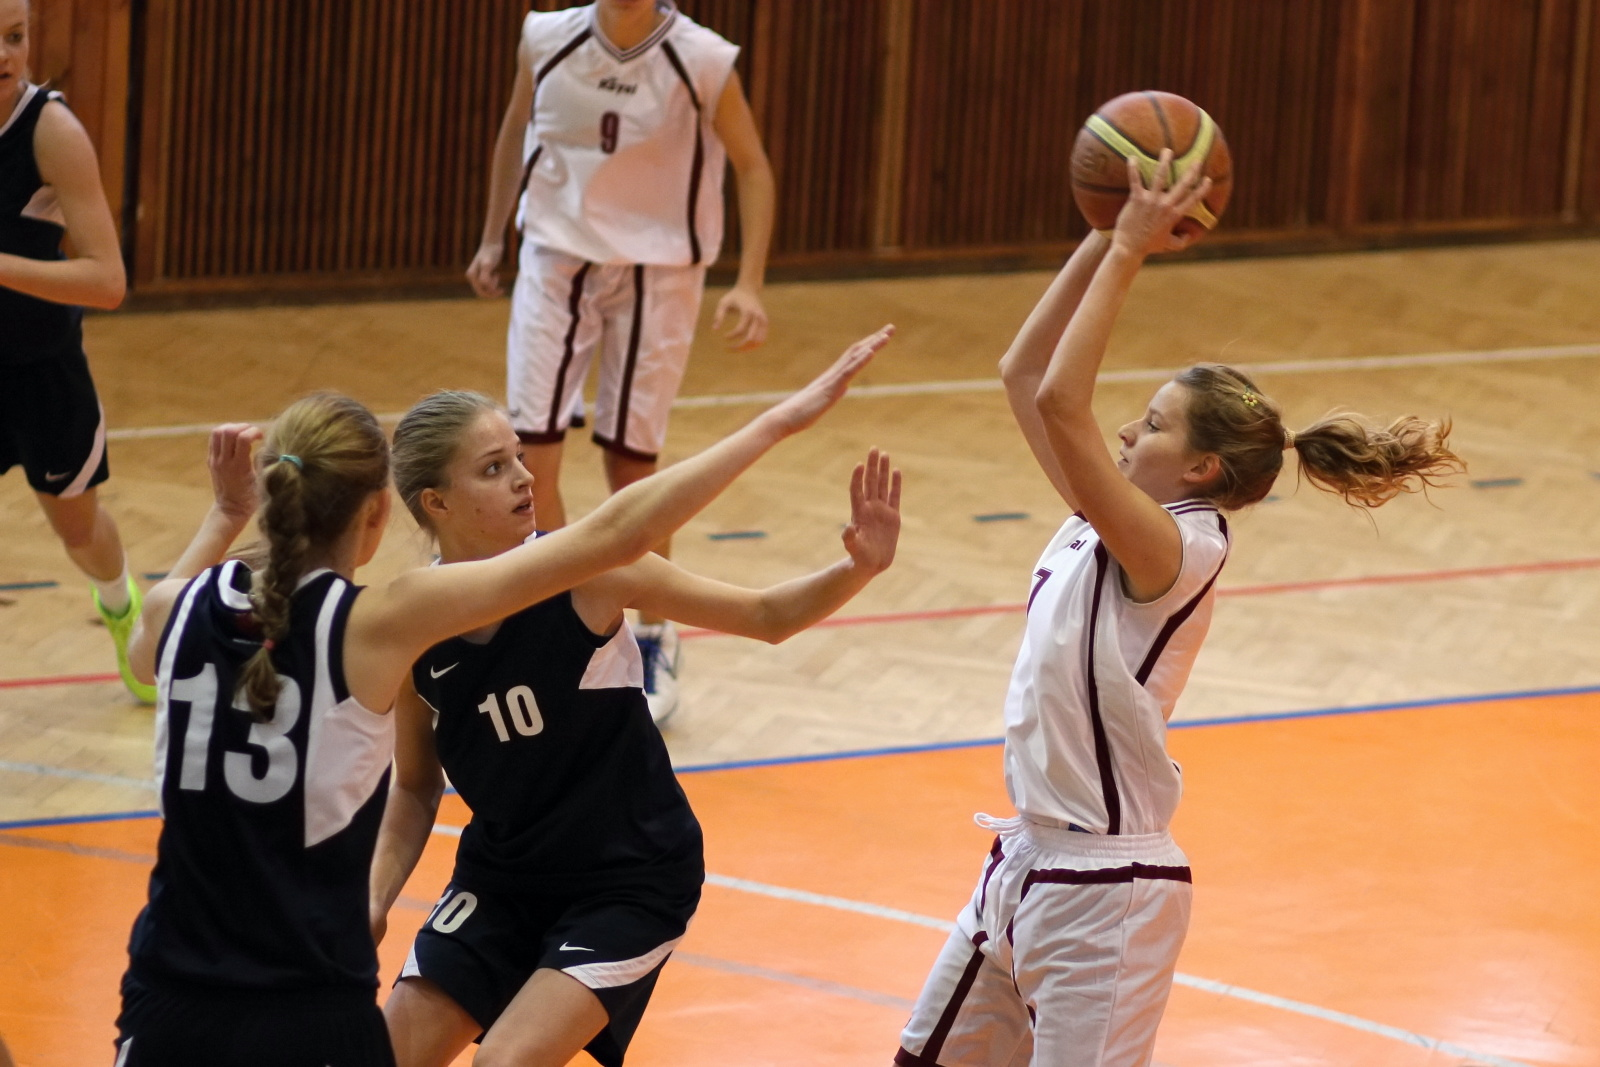 bk-zvolen-petrzalka-basketbal-juniorky-2011-5